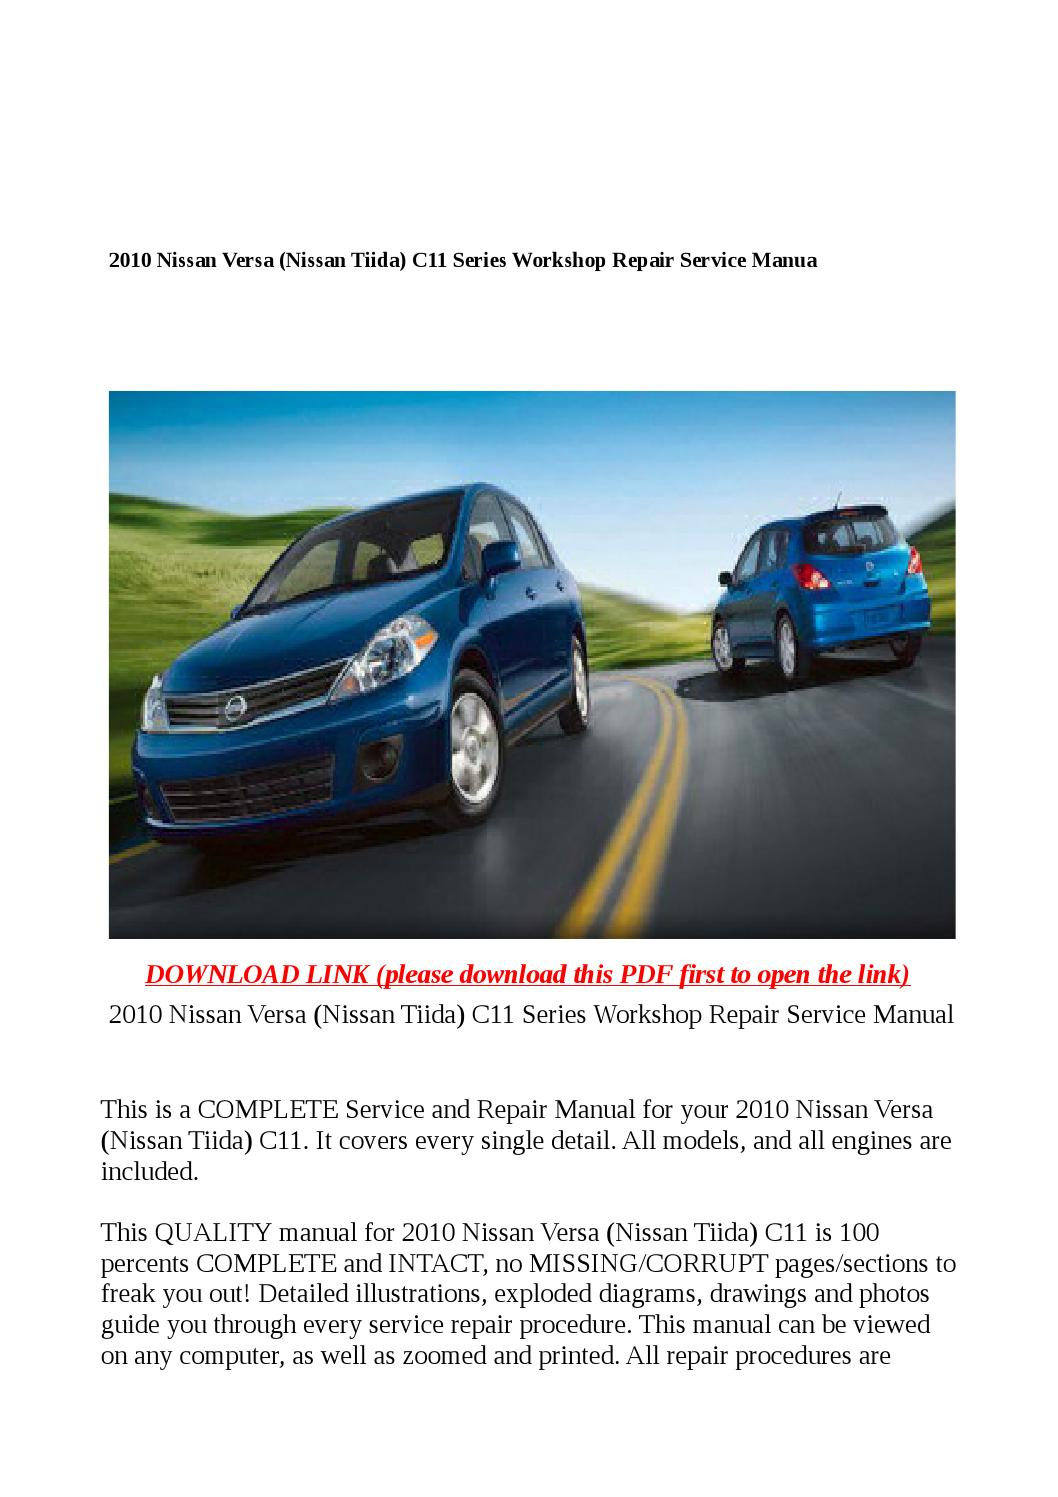 2010 Nissan Versa  Nissan Tiida  C11 Series Workshop